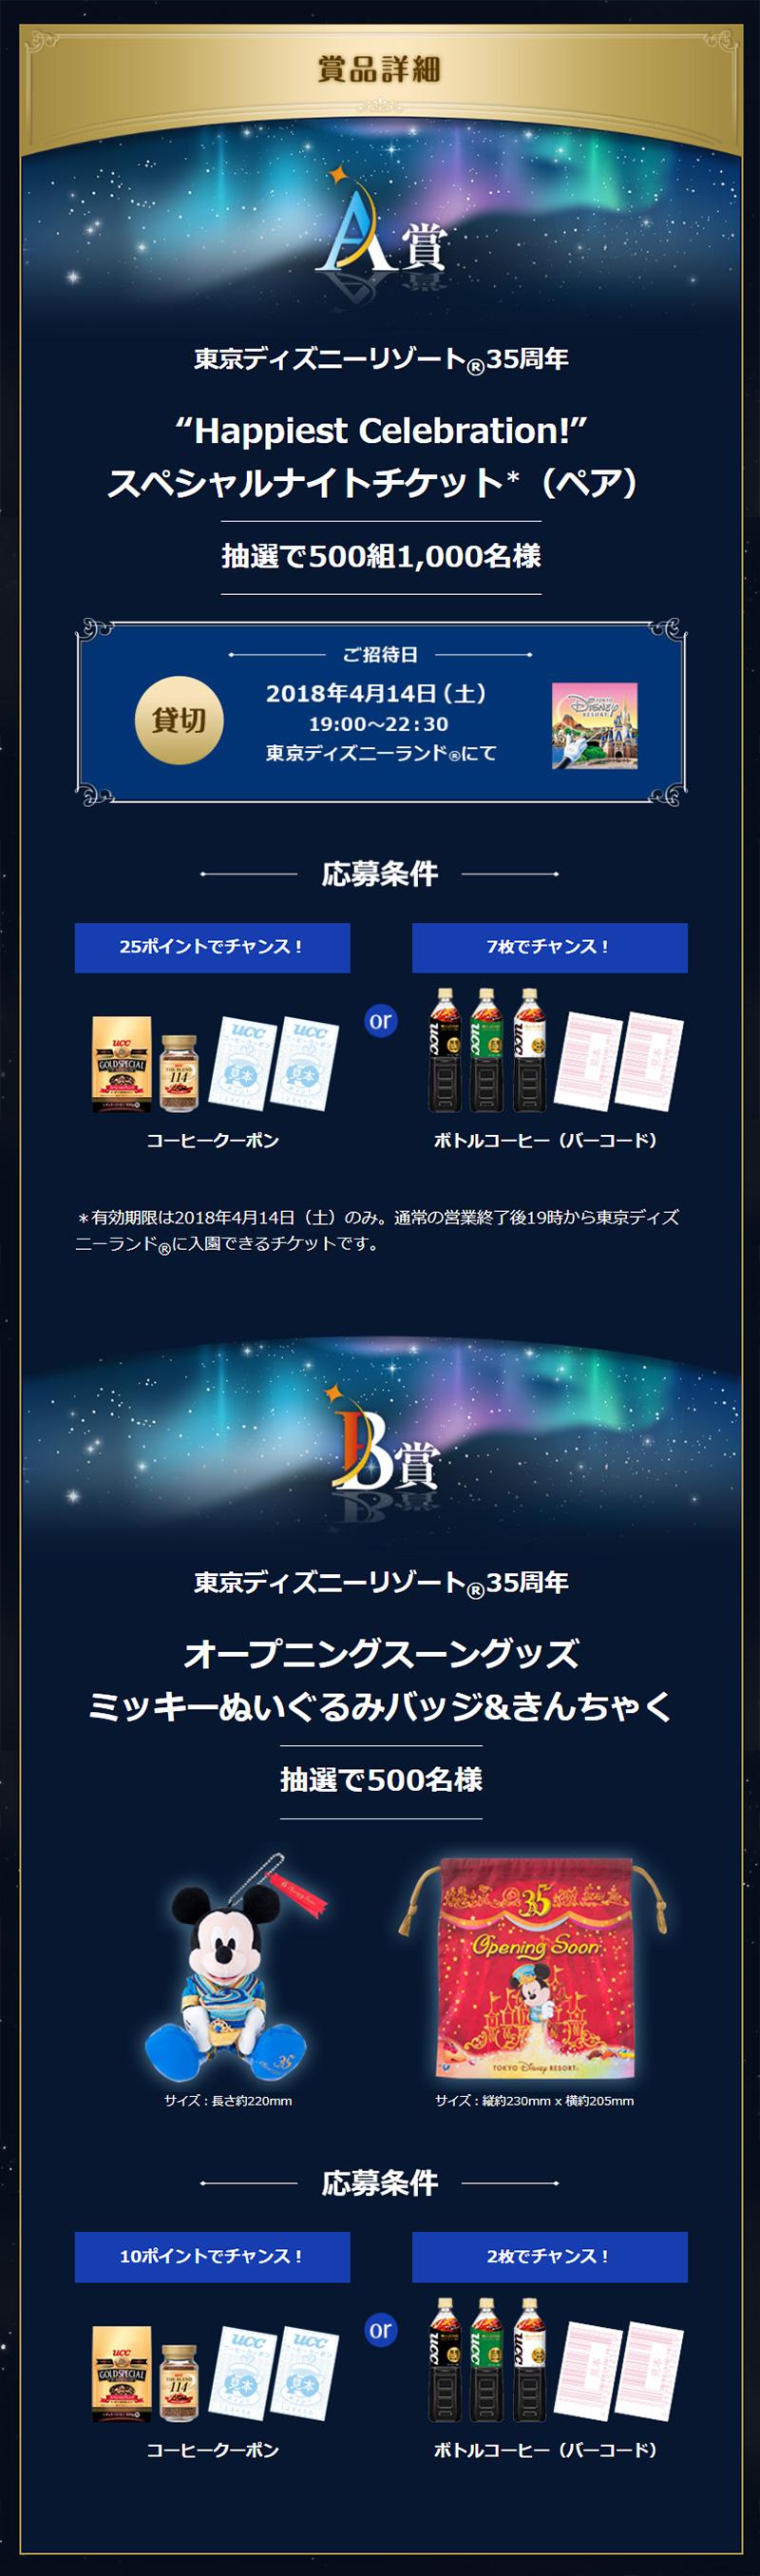 UCCコーヒー ディズニー懸賞キャンペーン2018春 プレゼント懸賞品